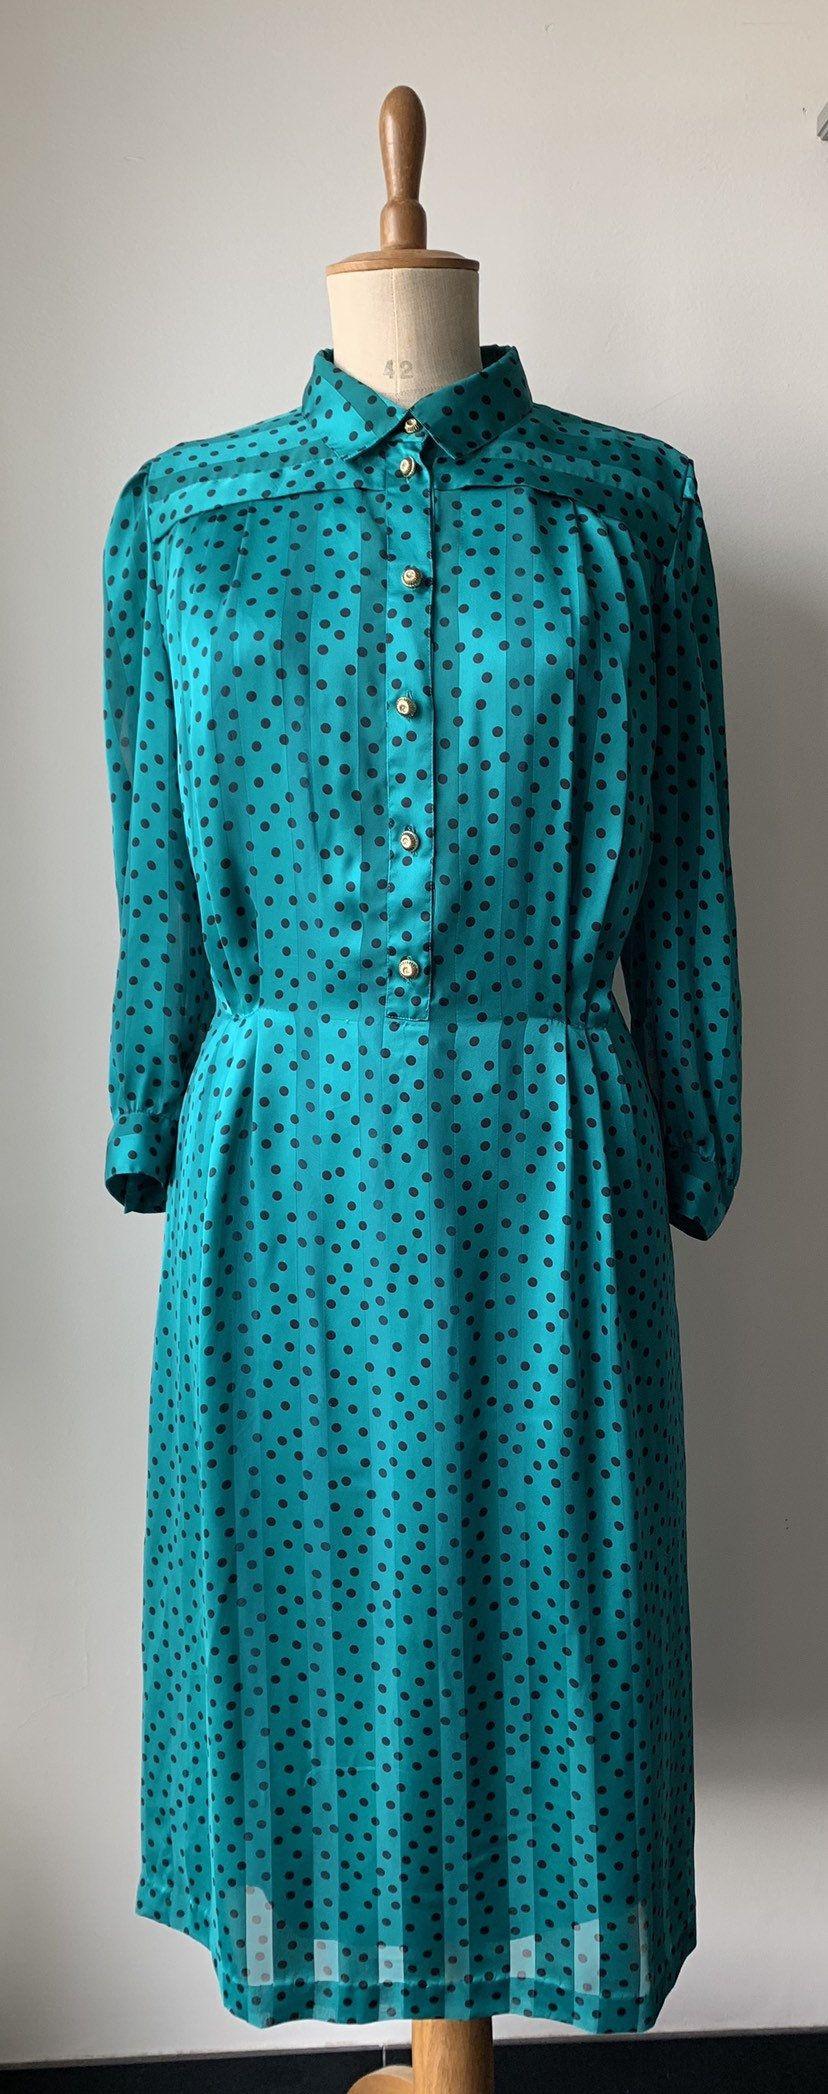 Just love the color Teal chiffon dress, Chiffon dress vintage, black polka dot teal…